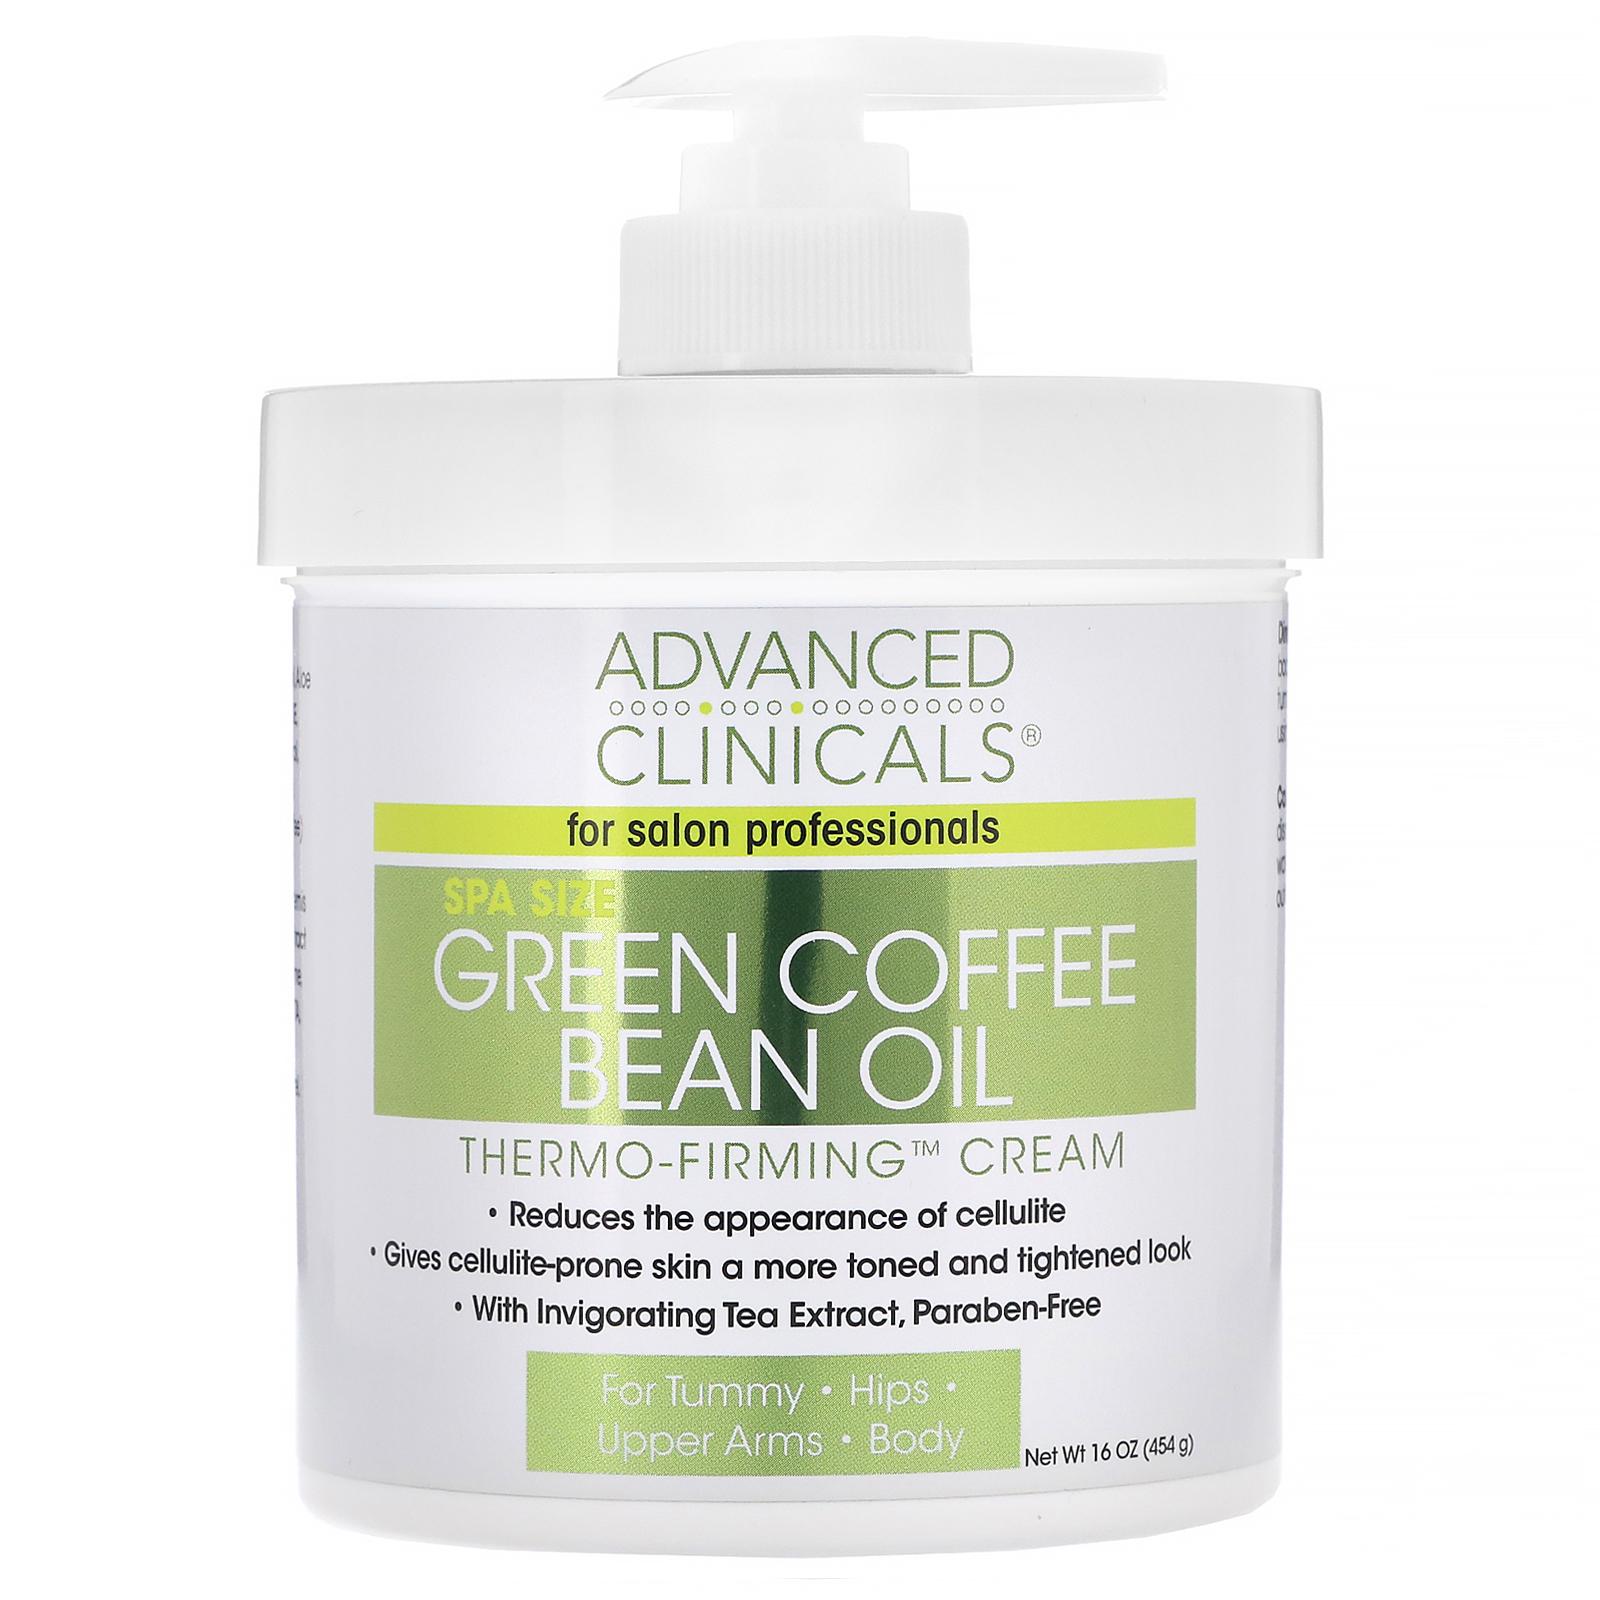 Advanced Clinicals Green Coffee Bean Oil Thermo Firming Cream